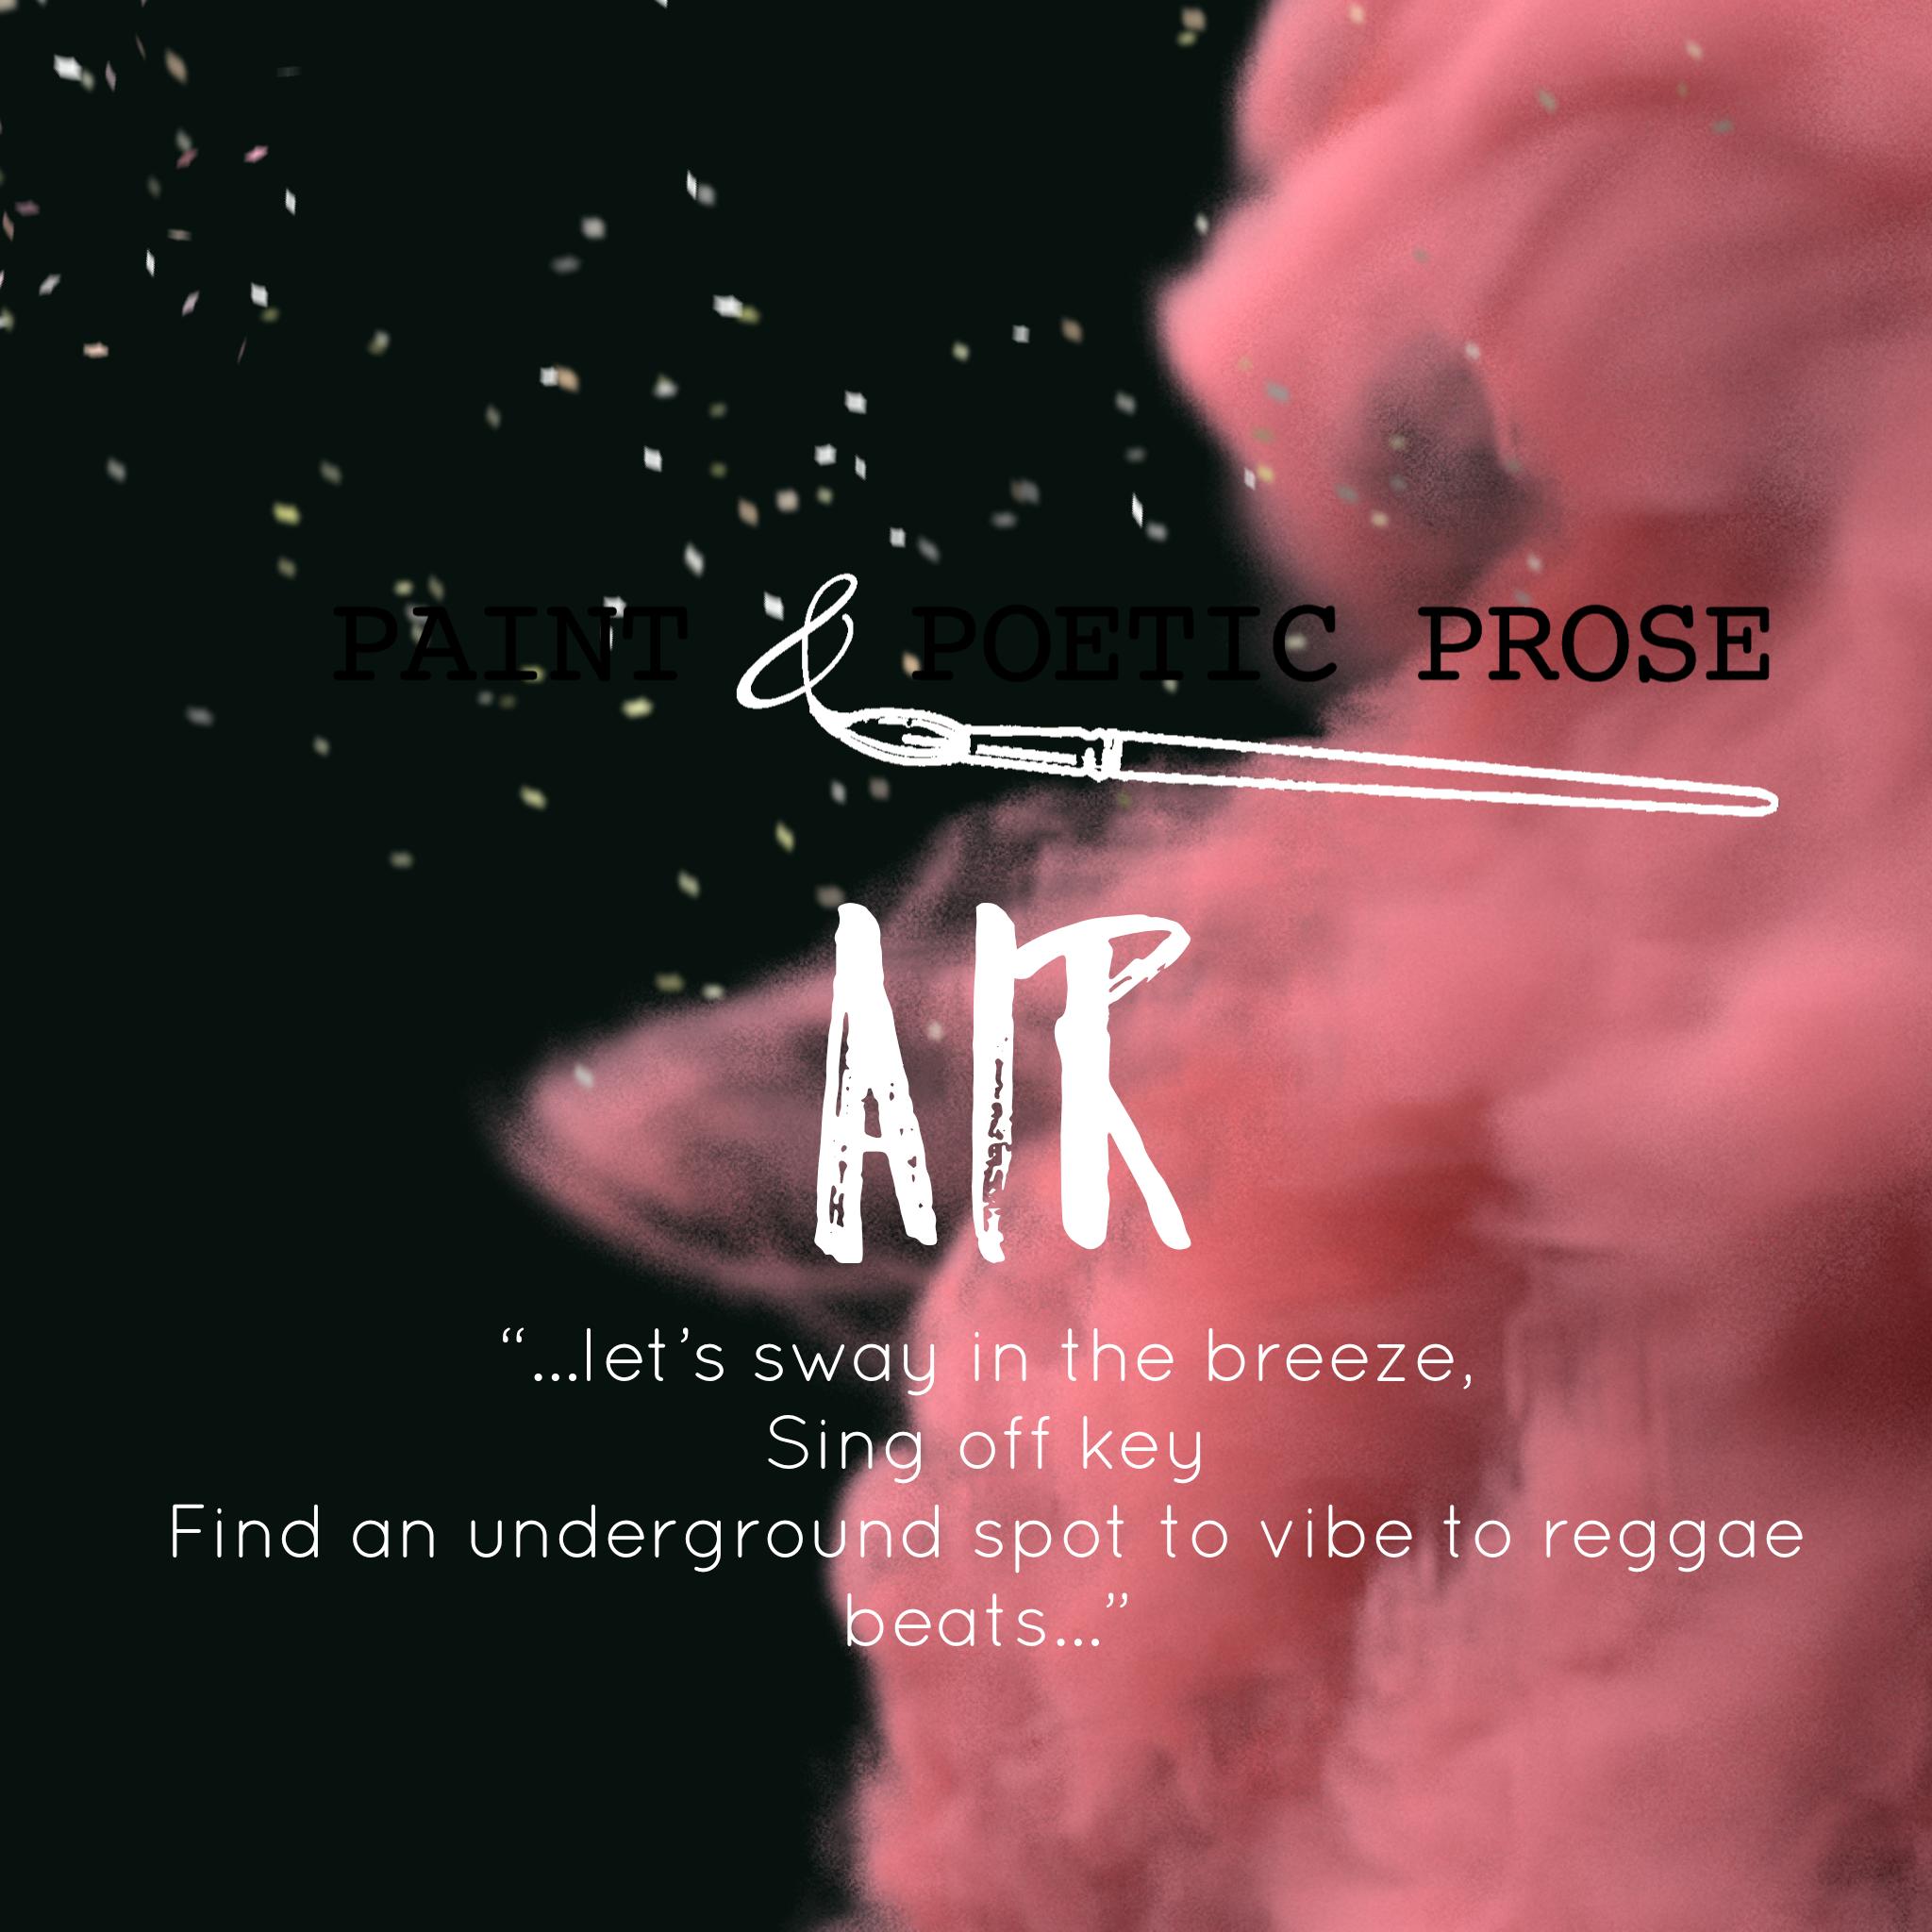 Paint & Prose - Air